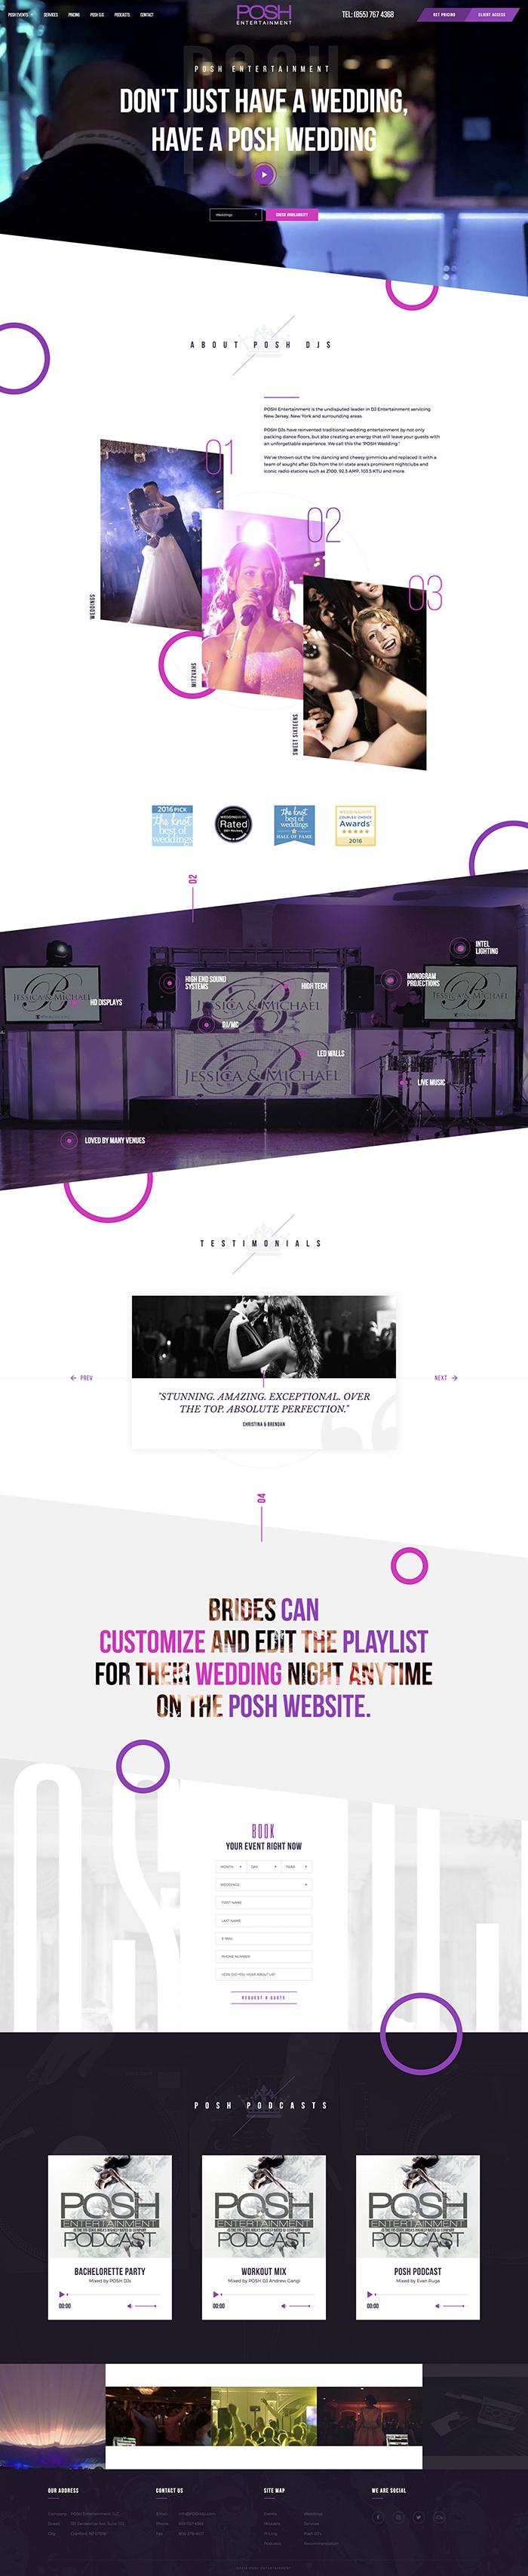 Posh DJs Web Design